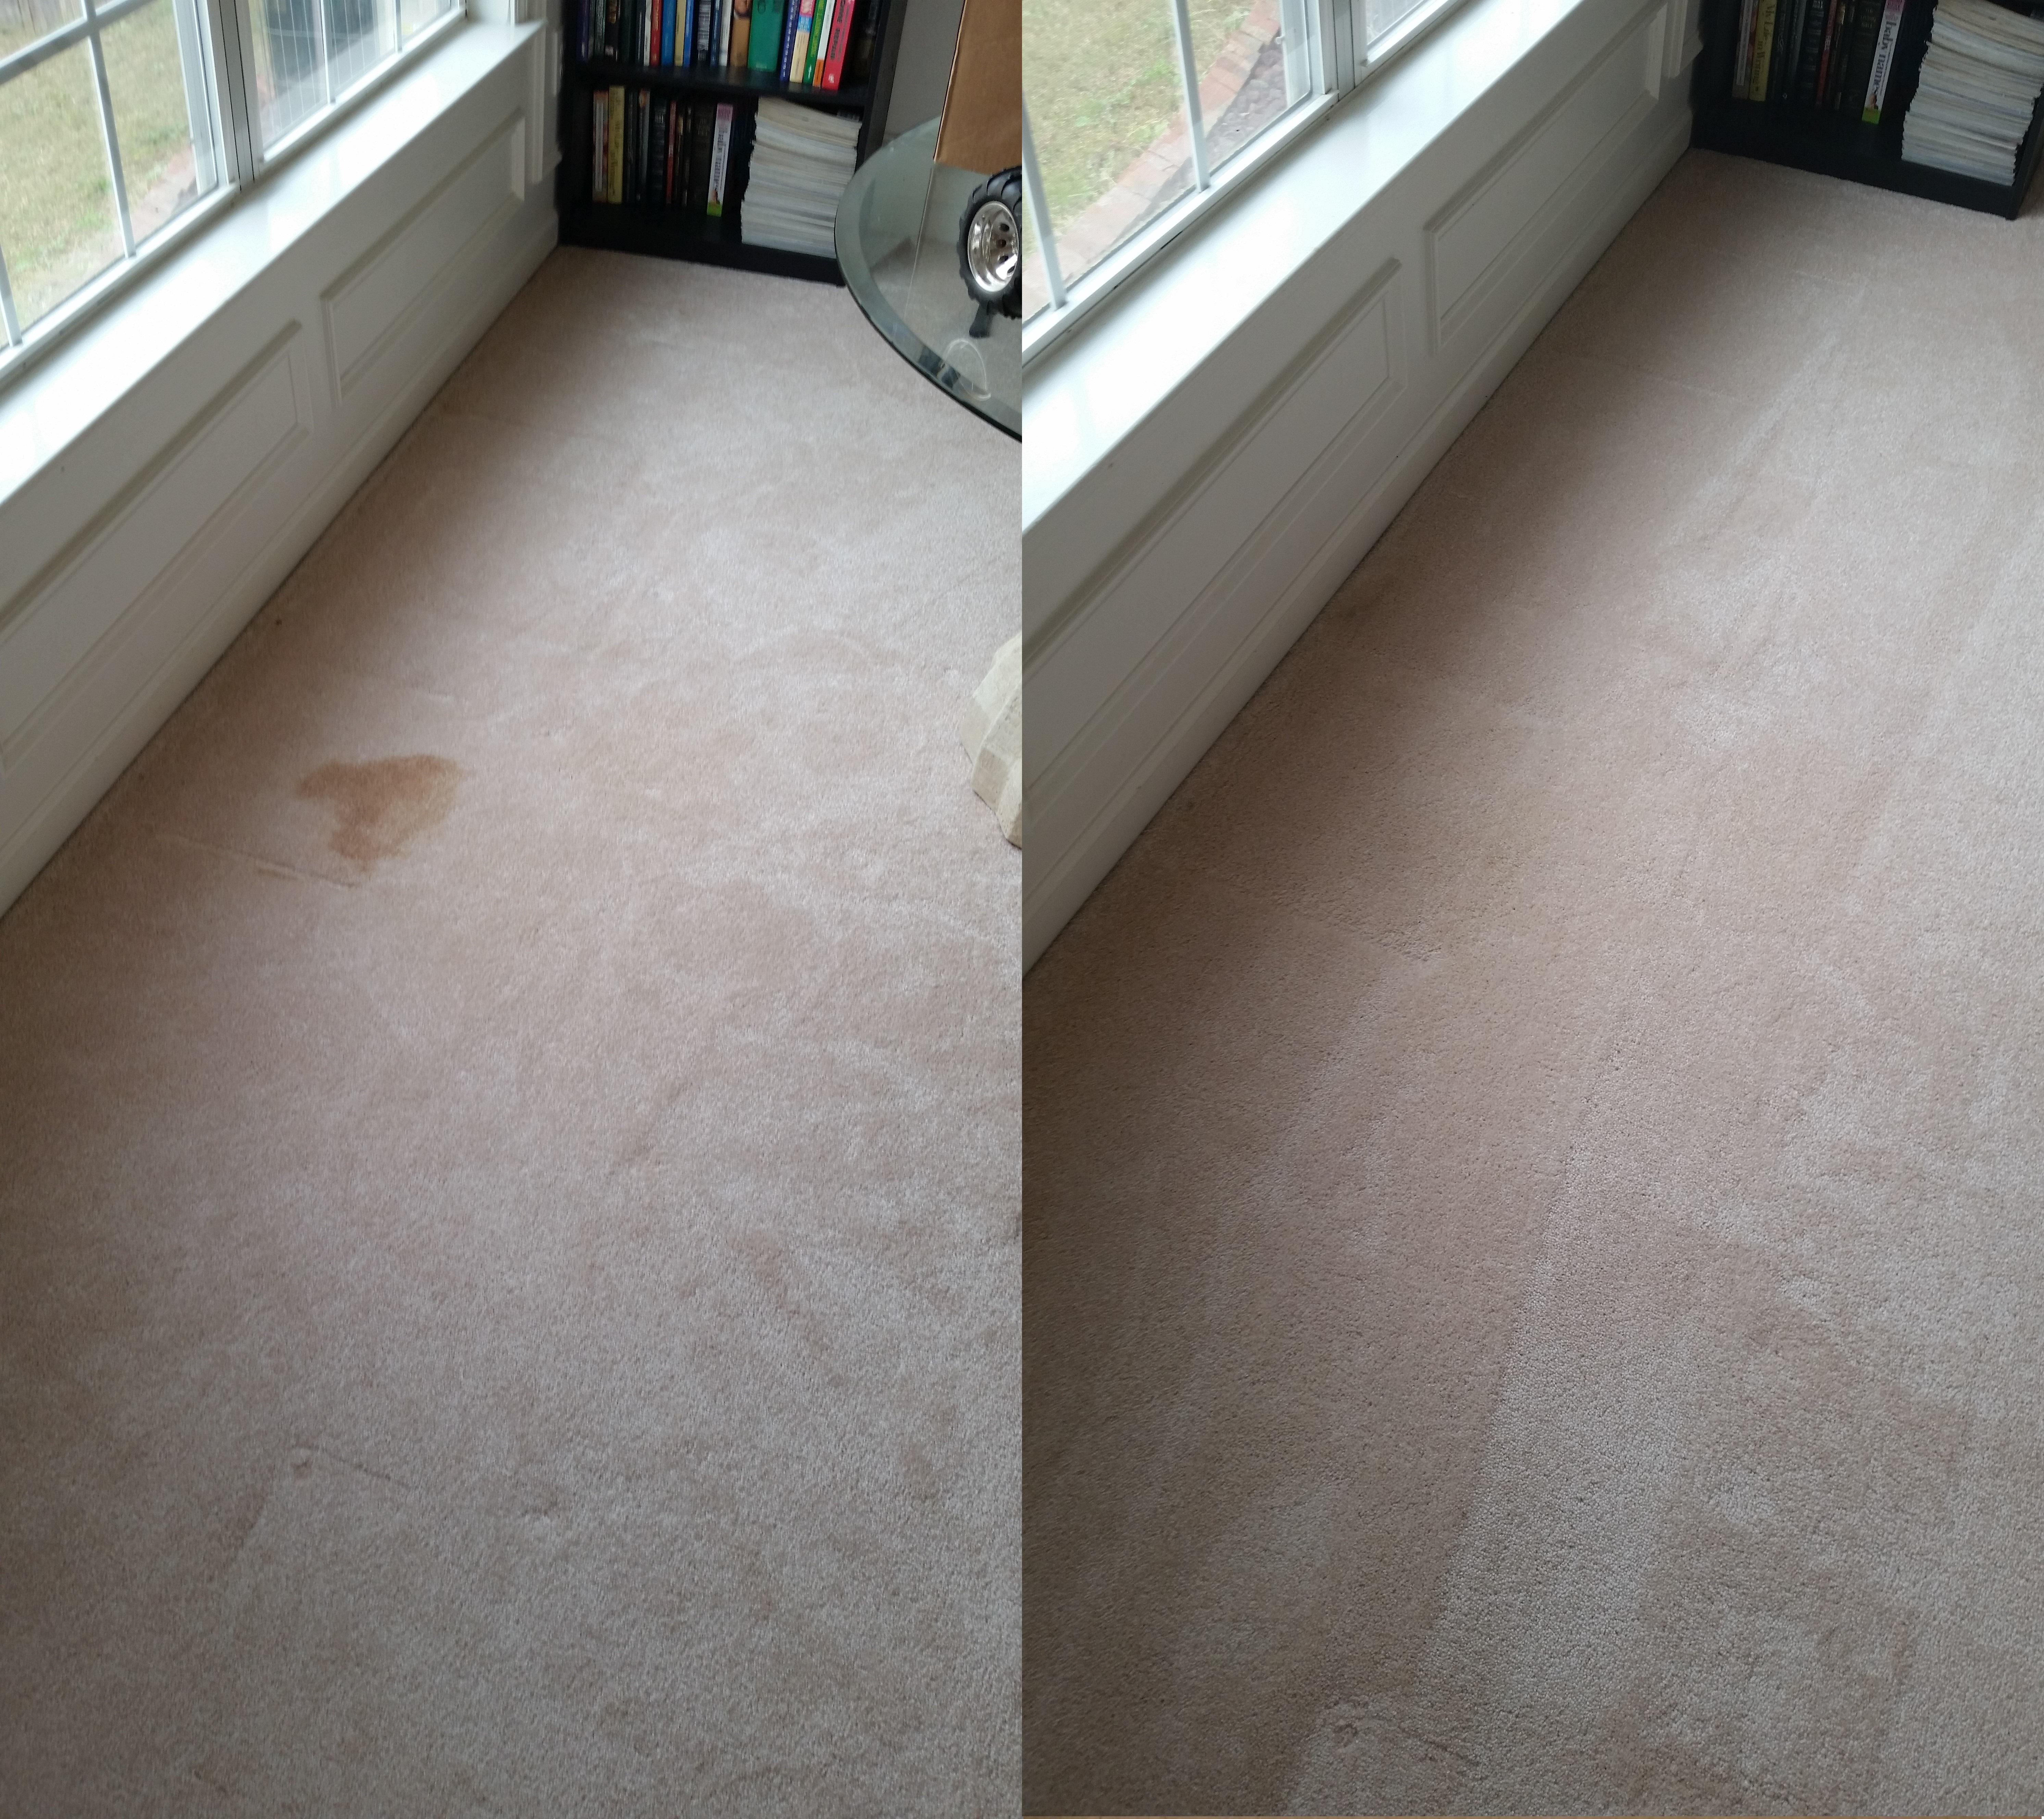 11-10-14-b-a-citrusolution-carpet-cleaning-suwanee-14